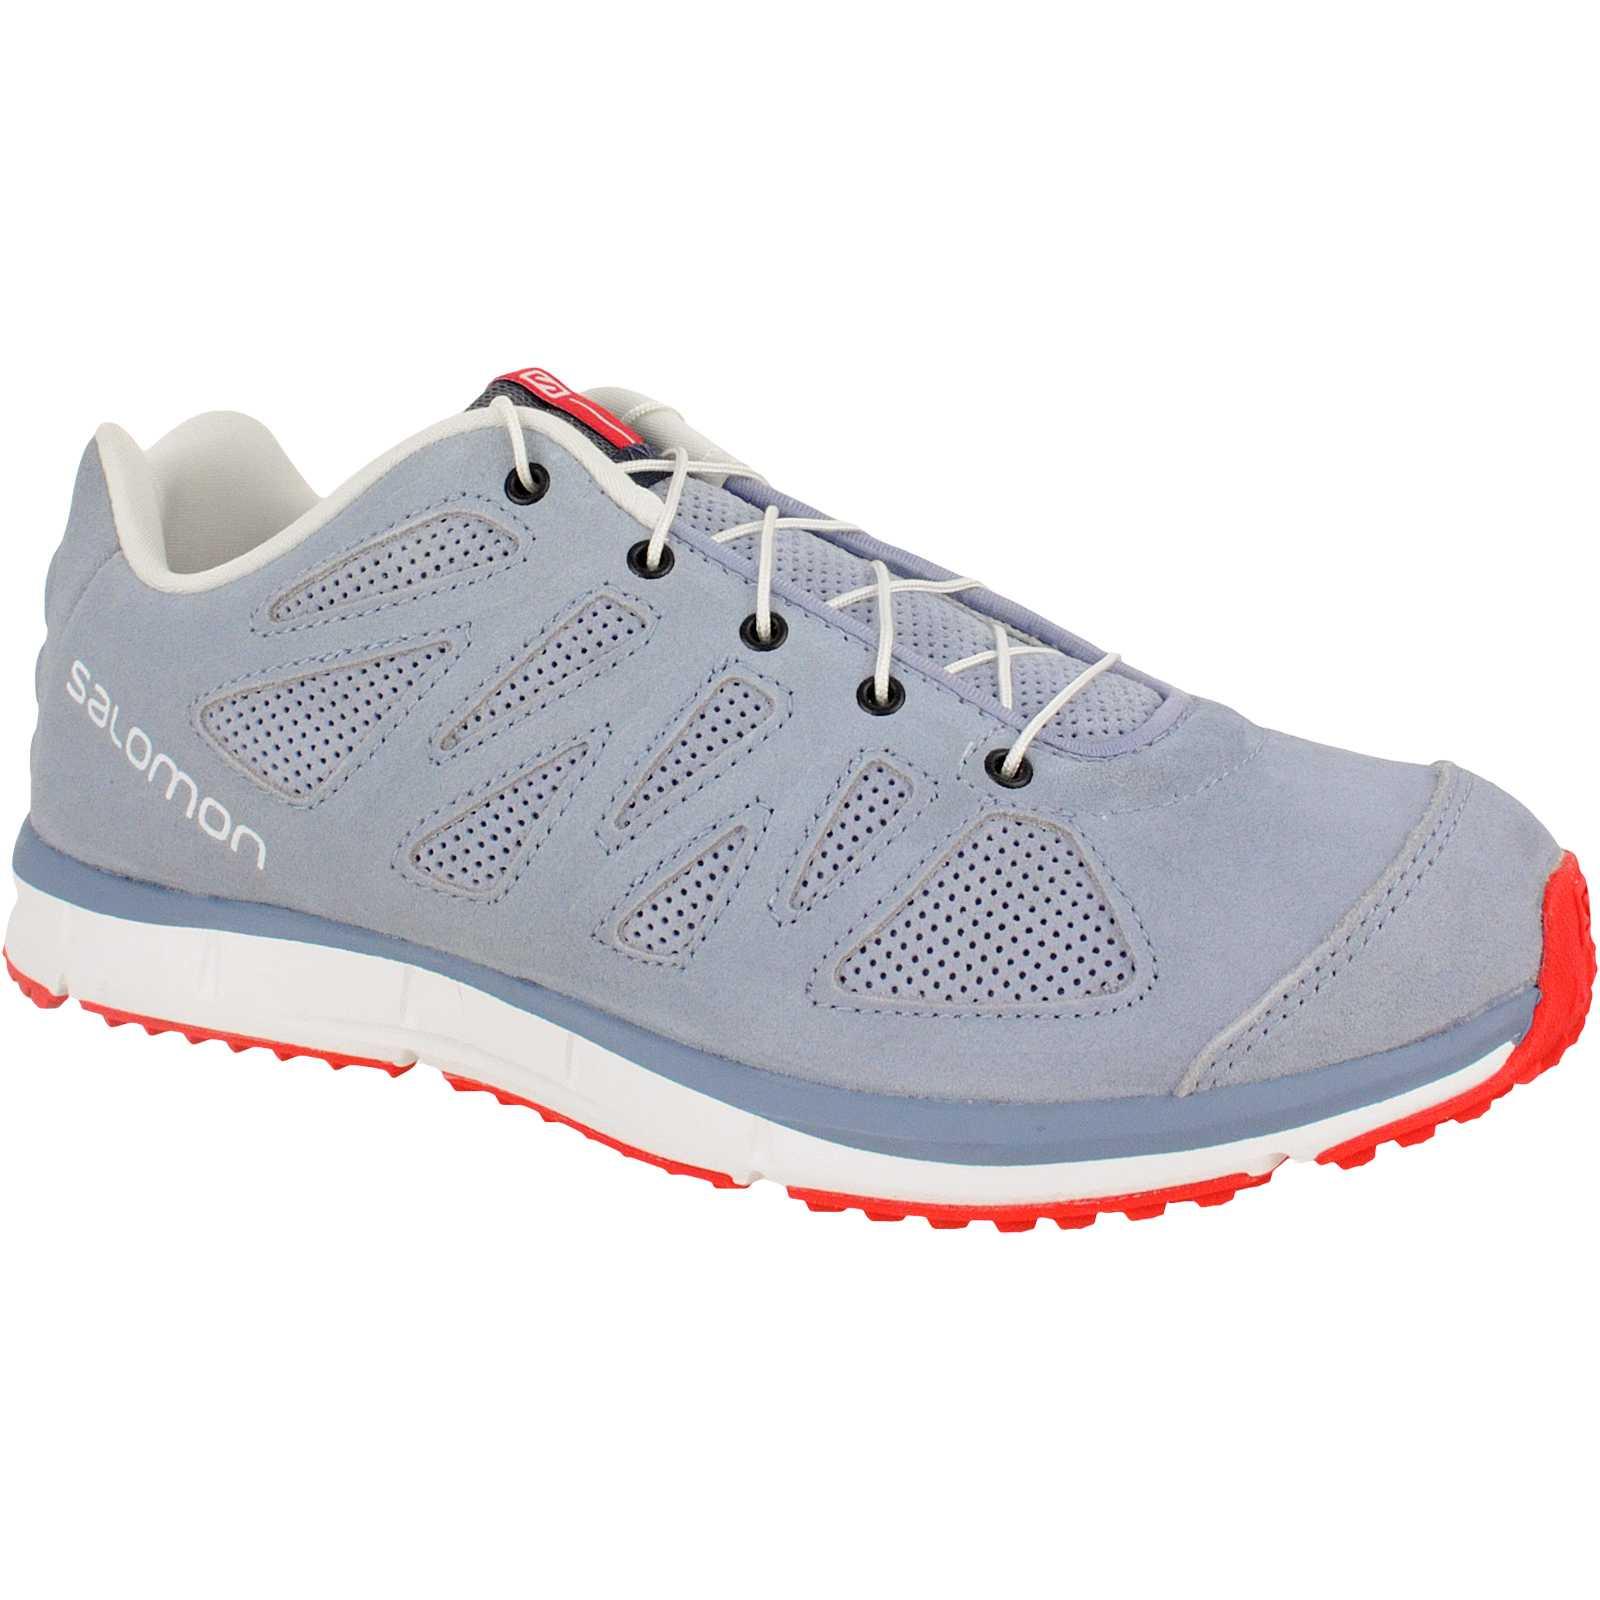 Pantofi sport femei Salomon Kalalau LTR 370606